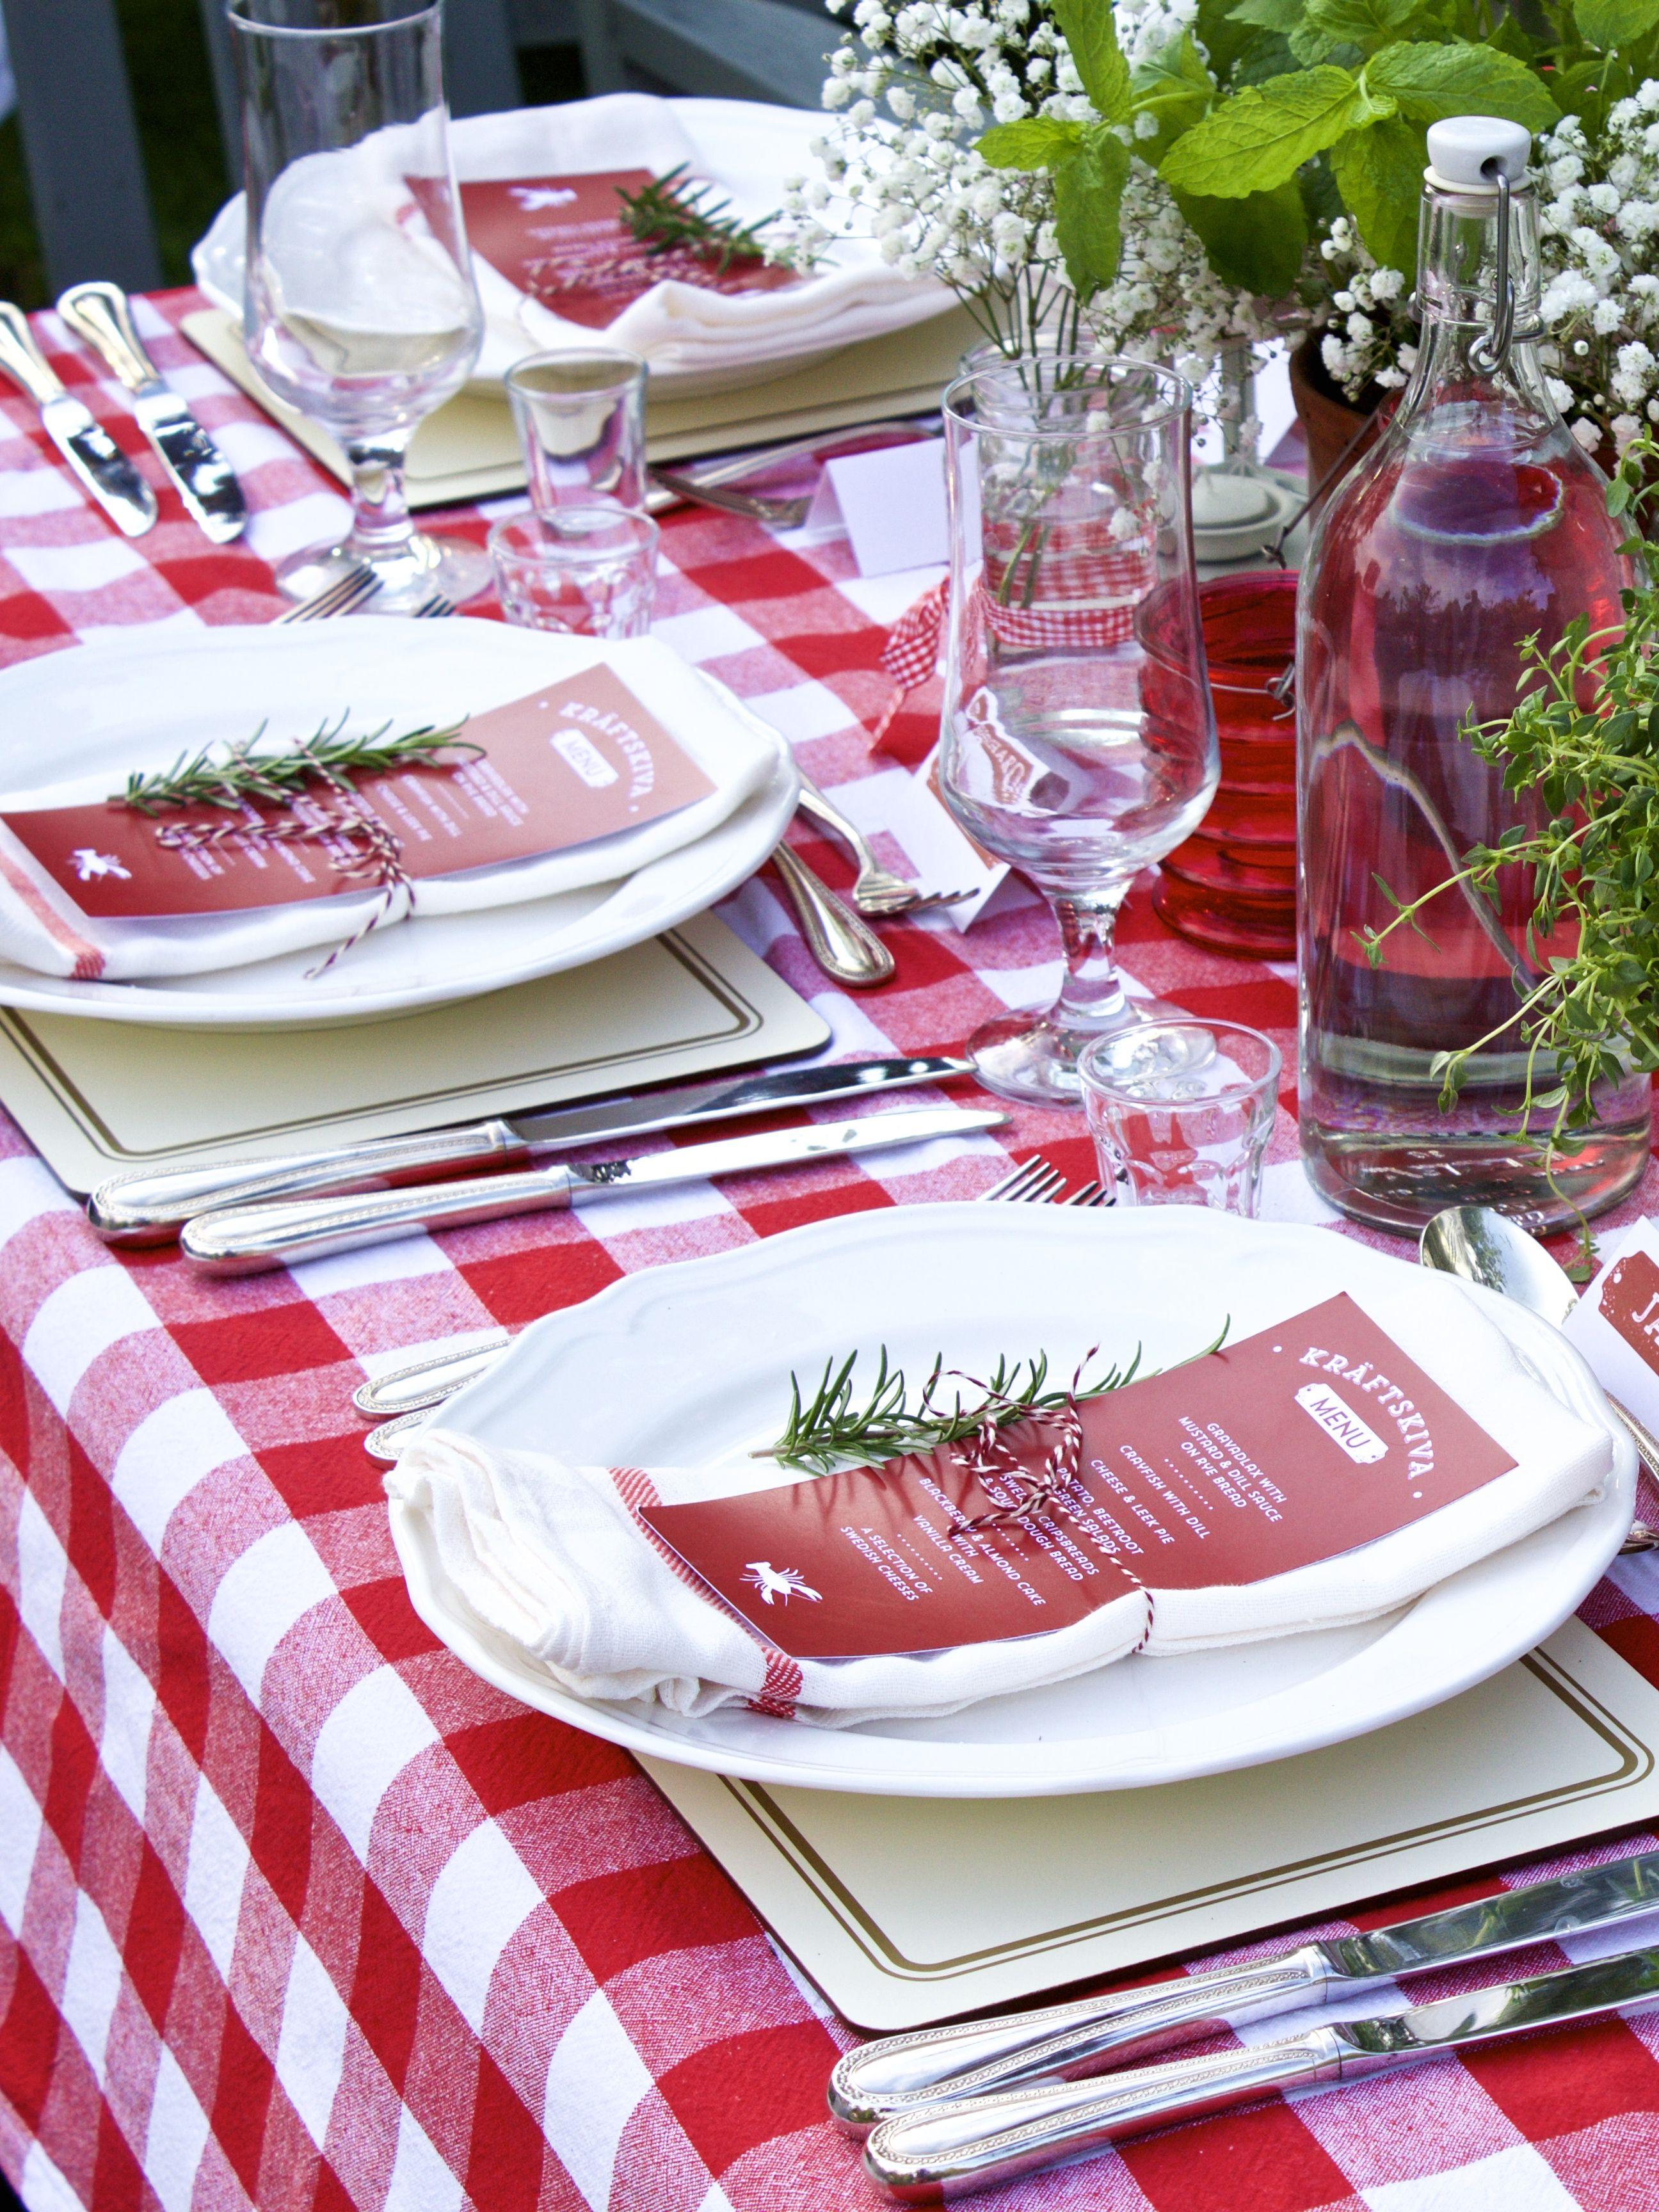 Table Setting For Swedish Inspired Crayfish Party Party I 2019 Dekoration Sommar Och Stuga